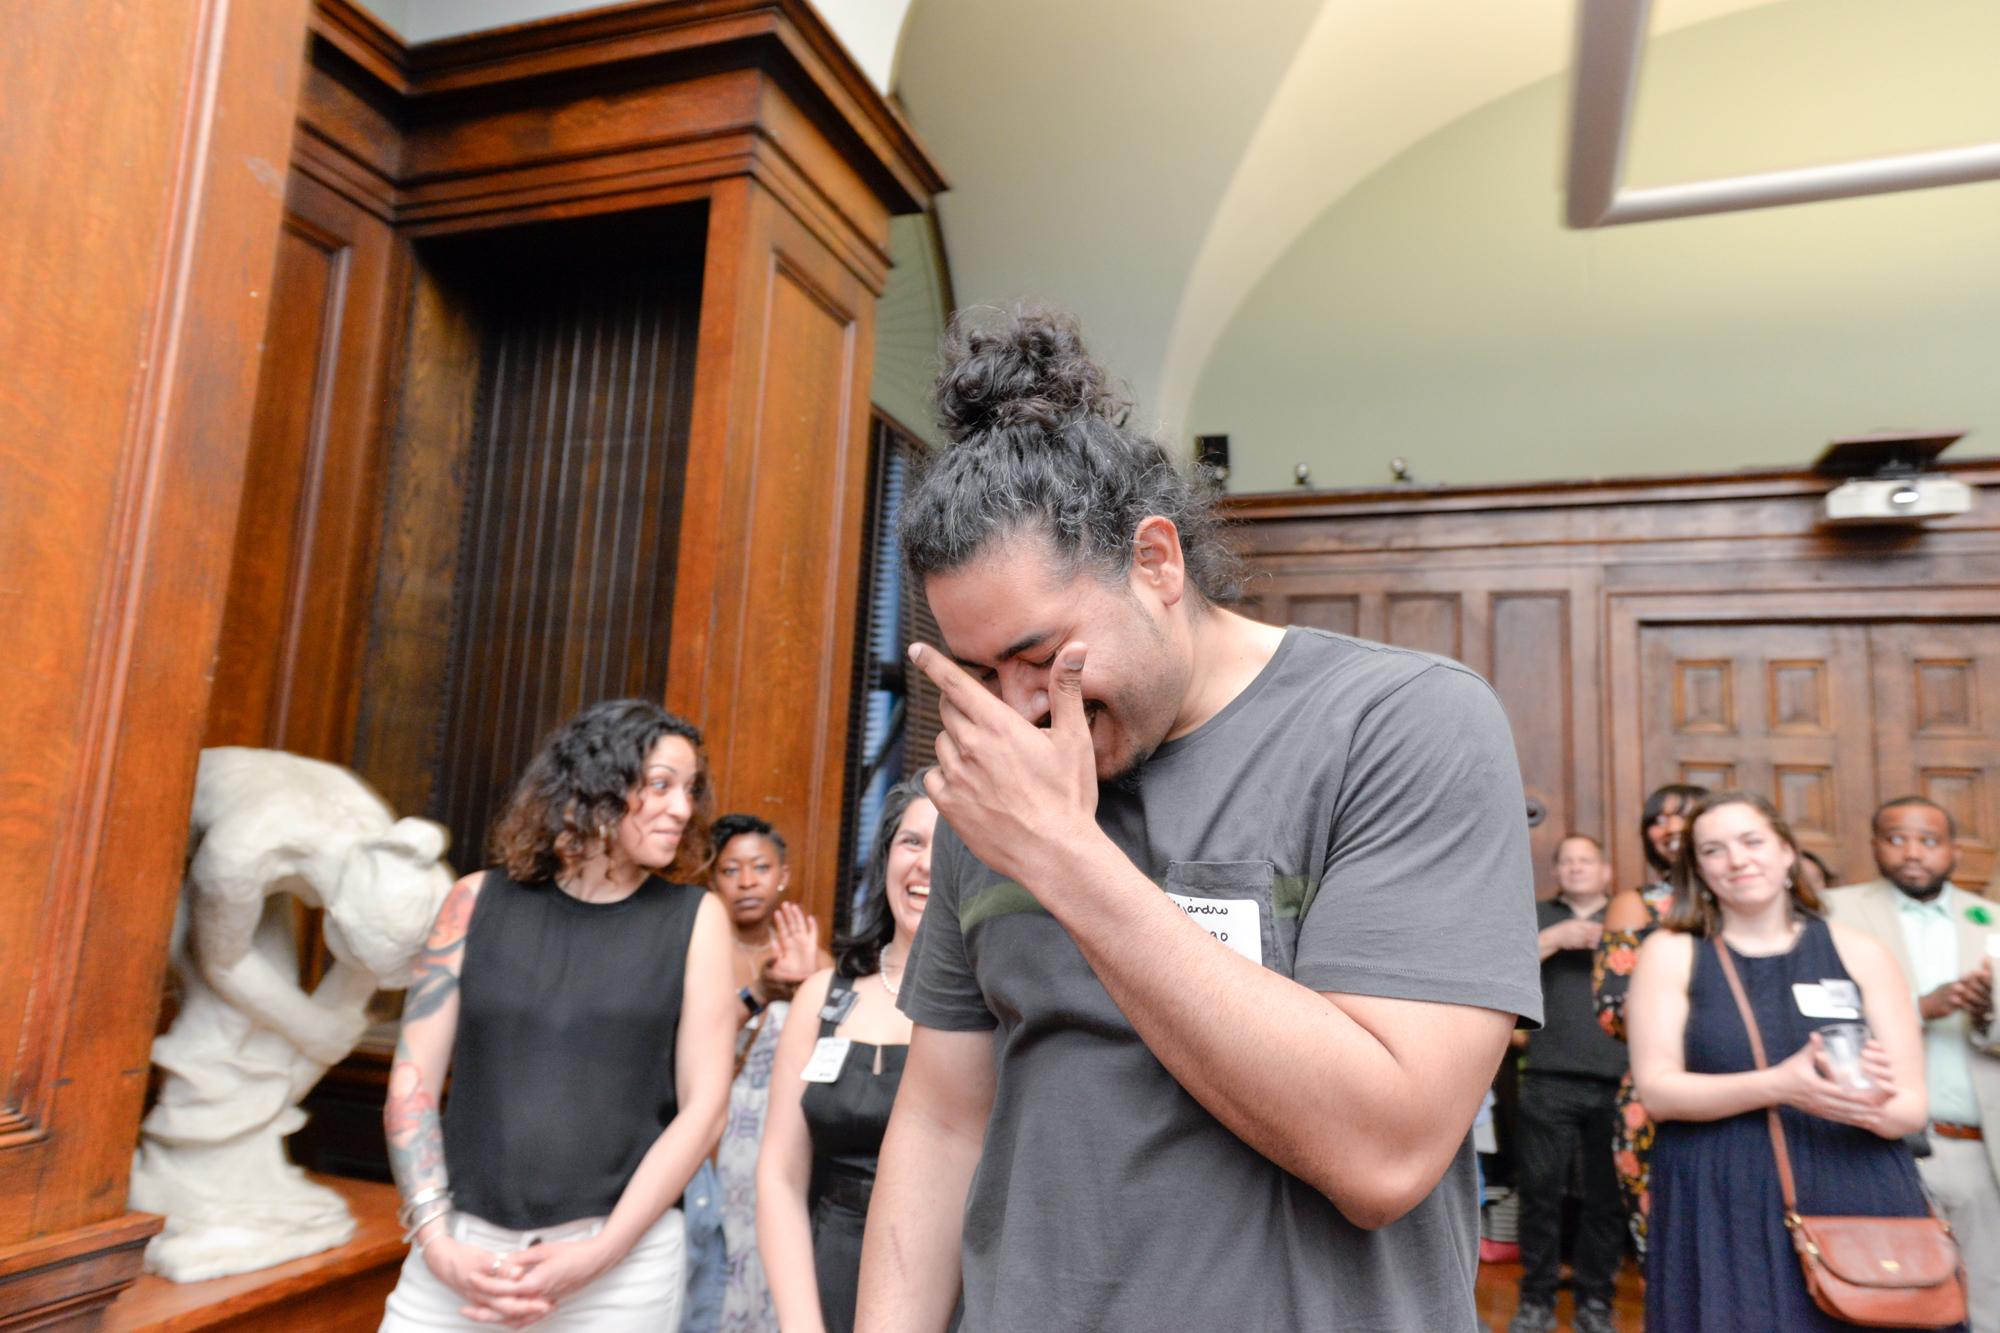 Center:  Alejandro Orengo, First Recipient of the Inaugural Harry T. Pratt Award (Graduate)